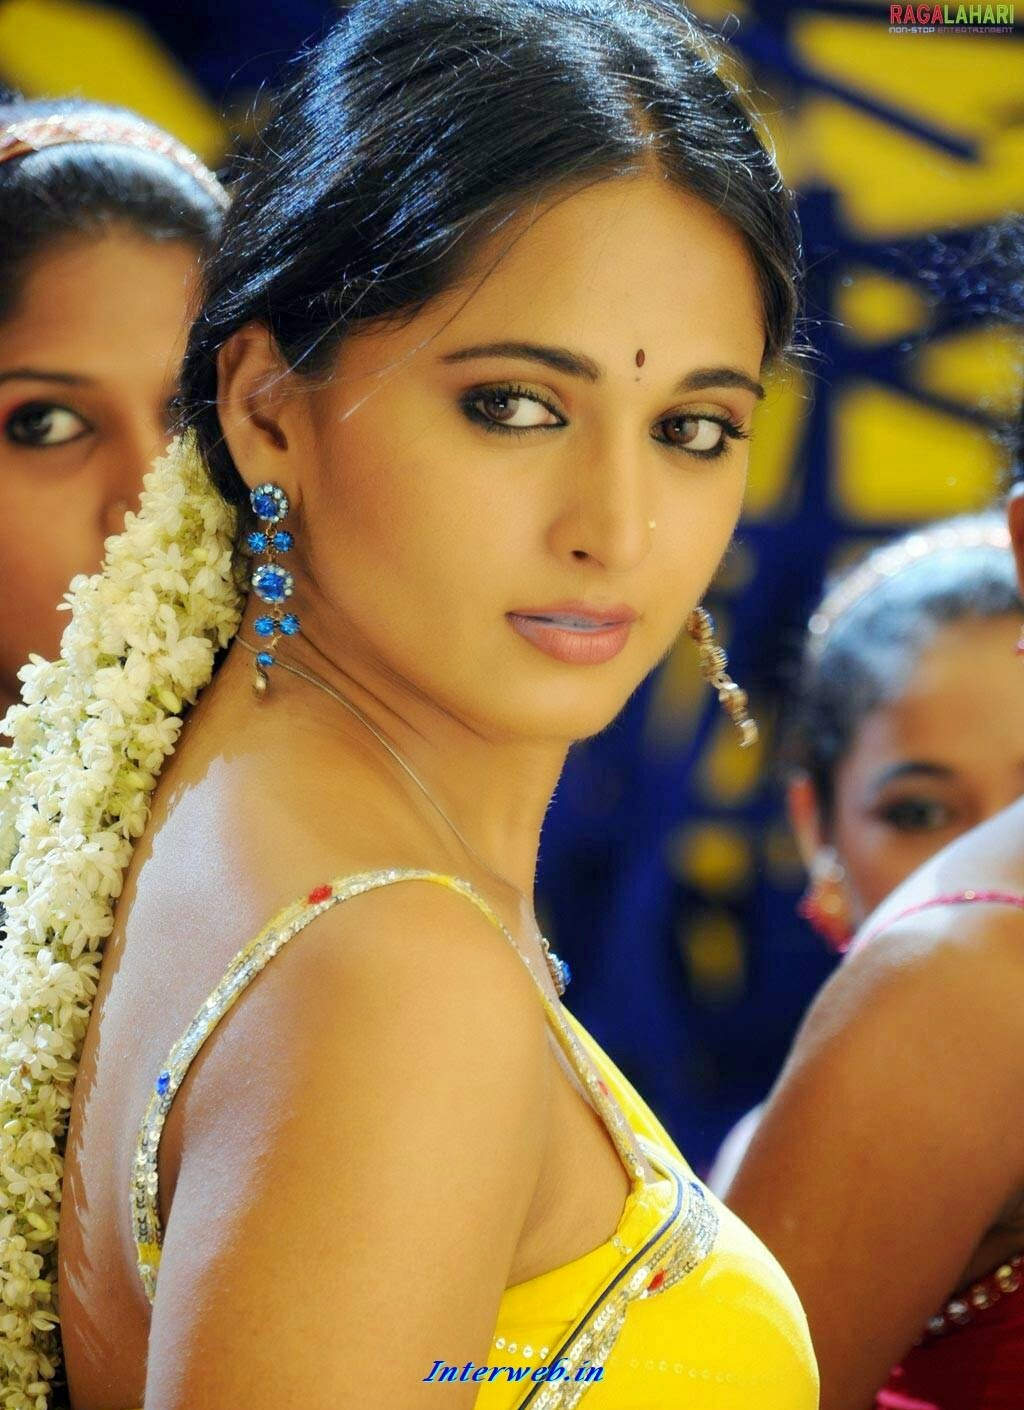 Telgu actress Anushka Shetty hot and unseen photos pics